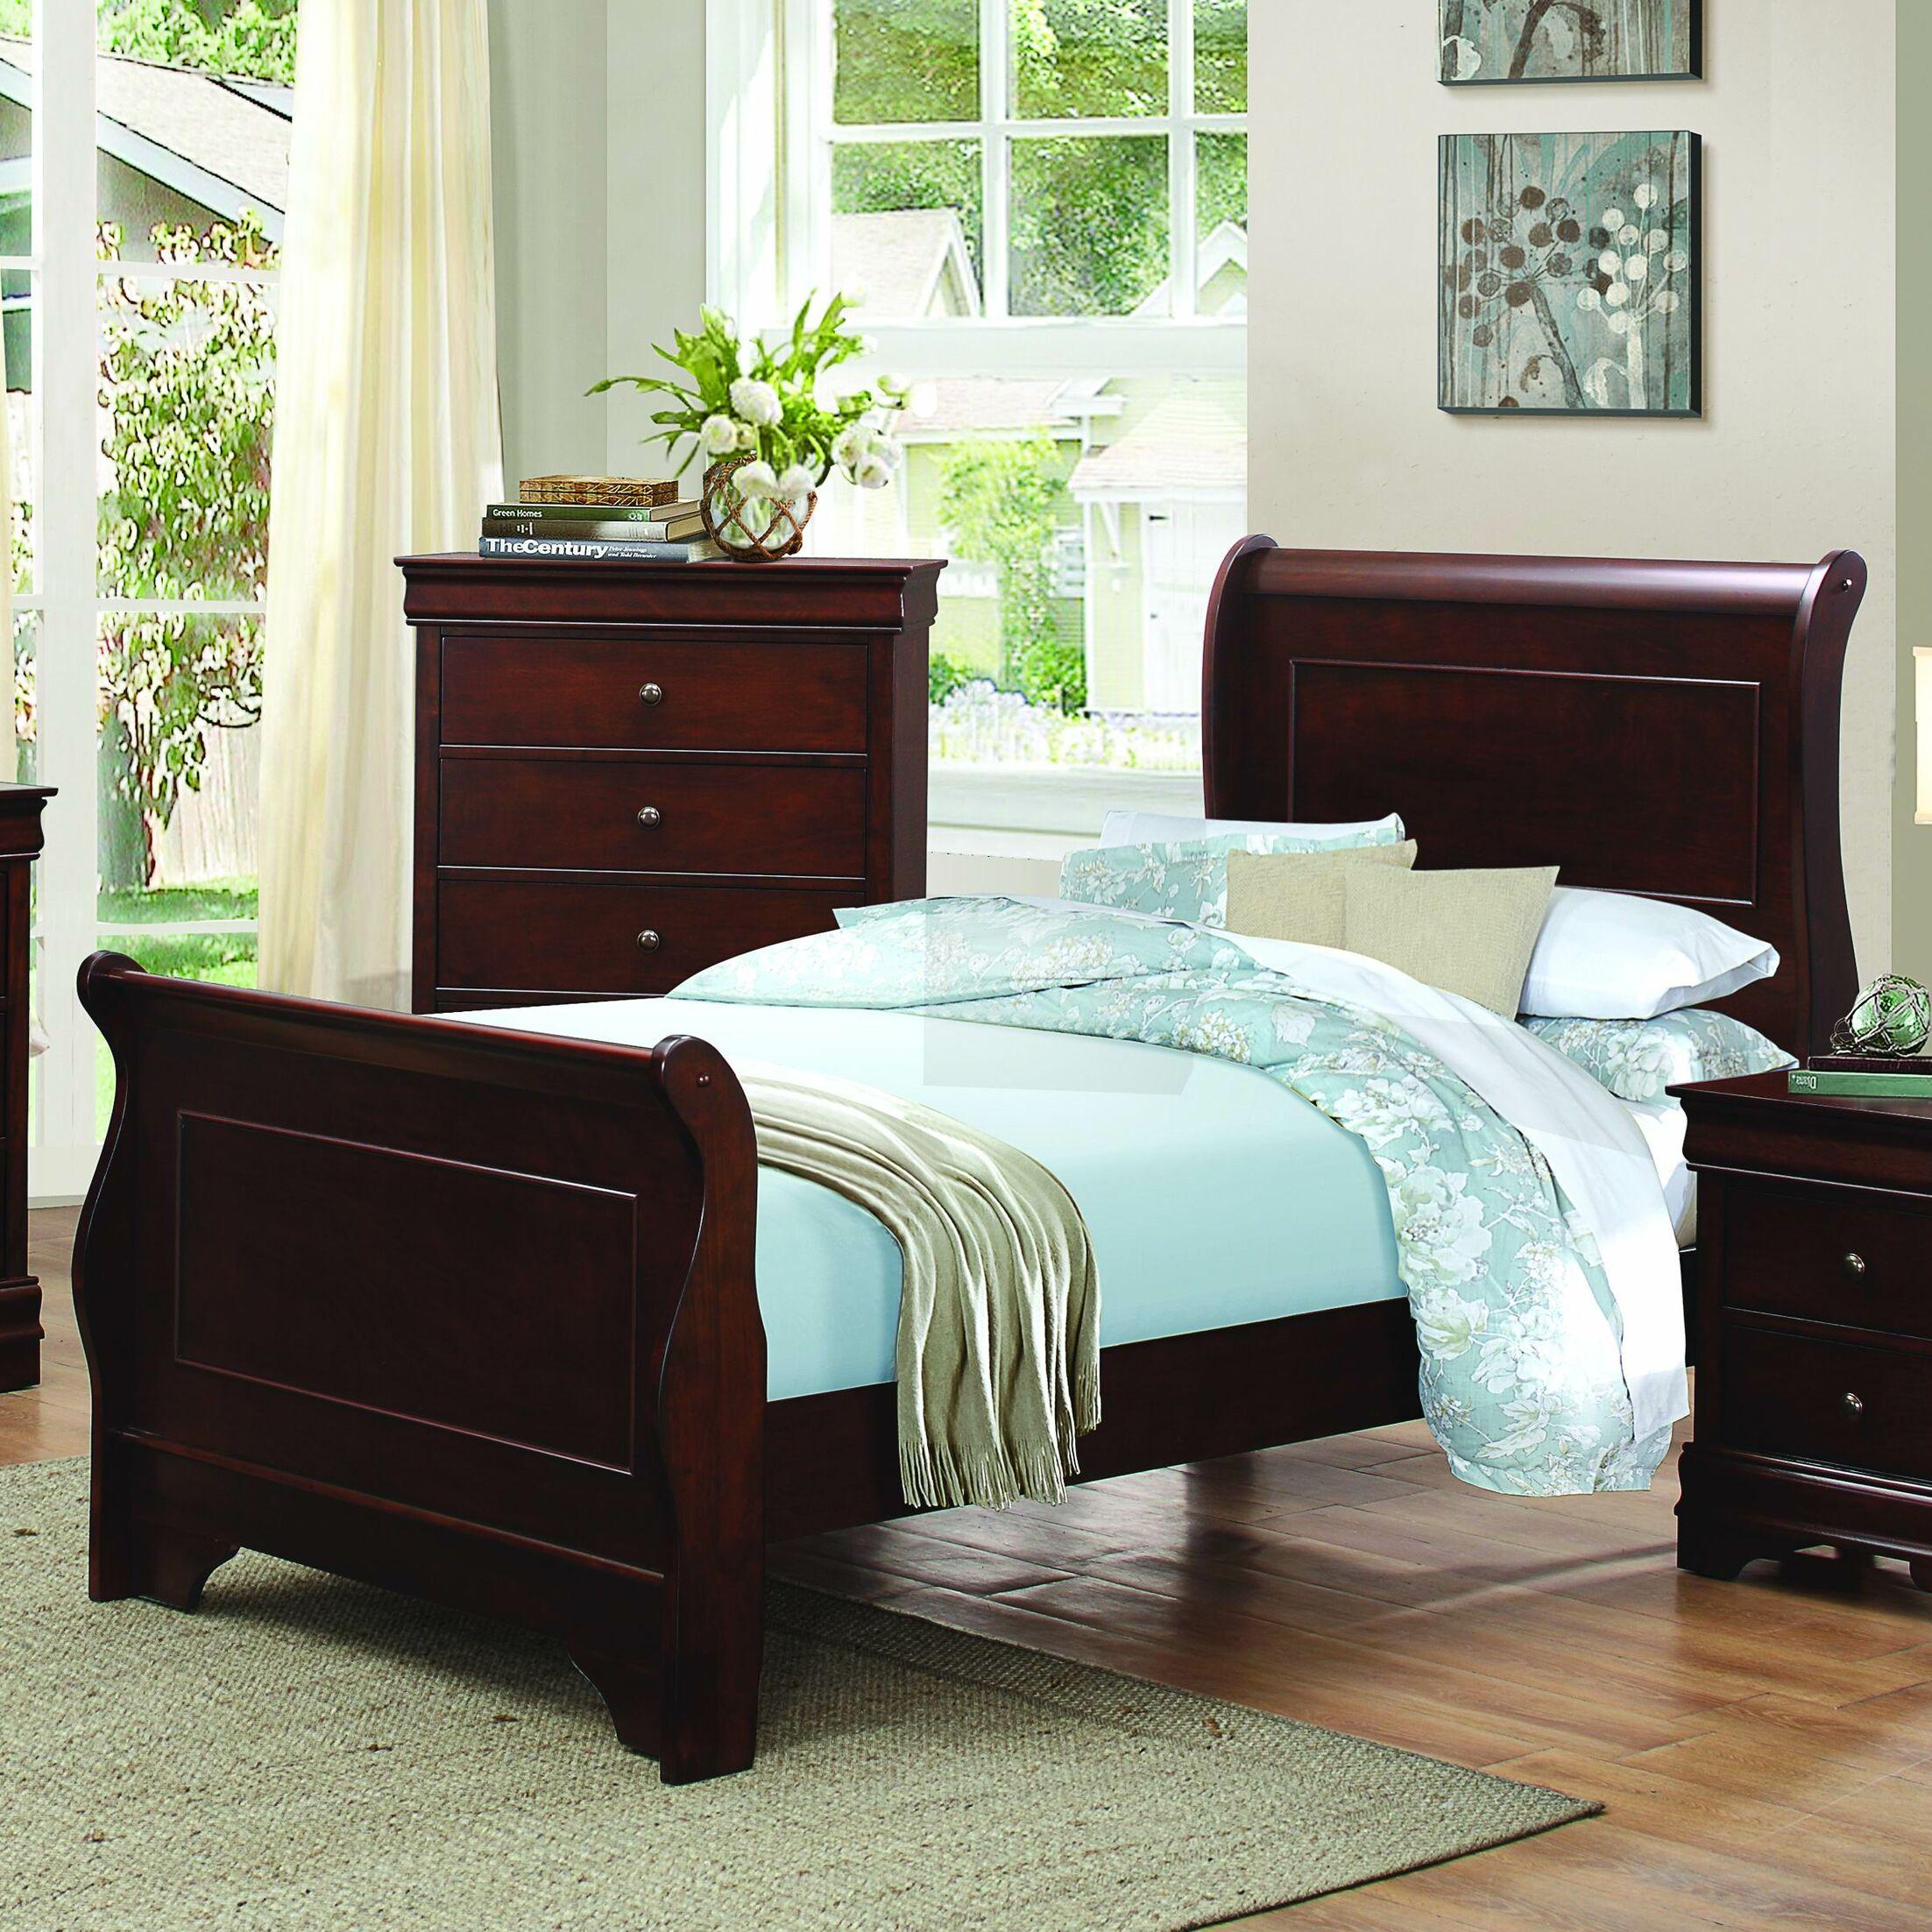 Abbeville Sleigh Bed Size: California King